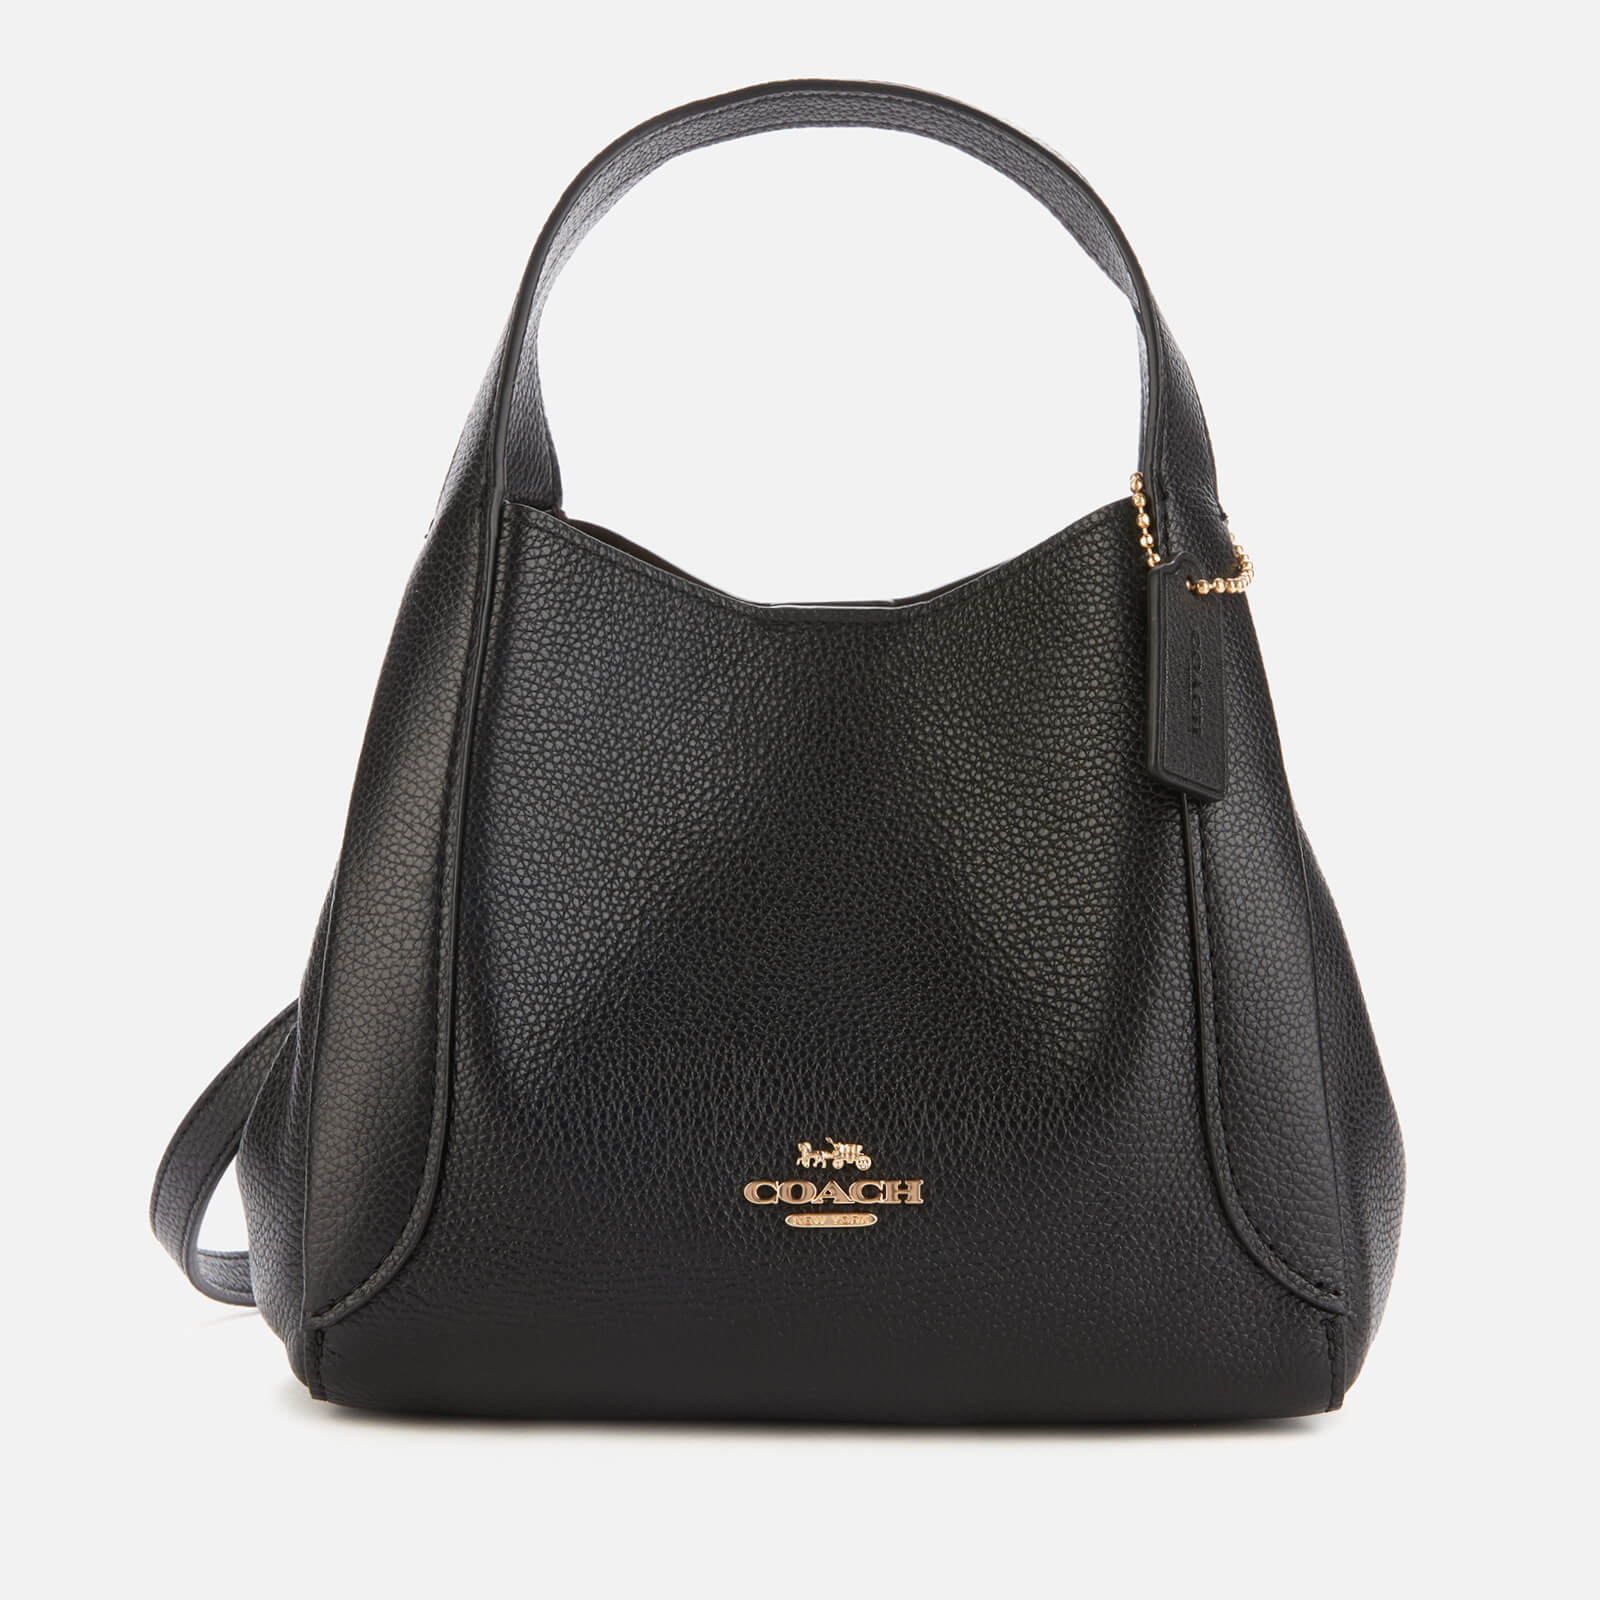 Coach Women's Hadley Hobo Bag 21 - Black